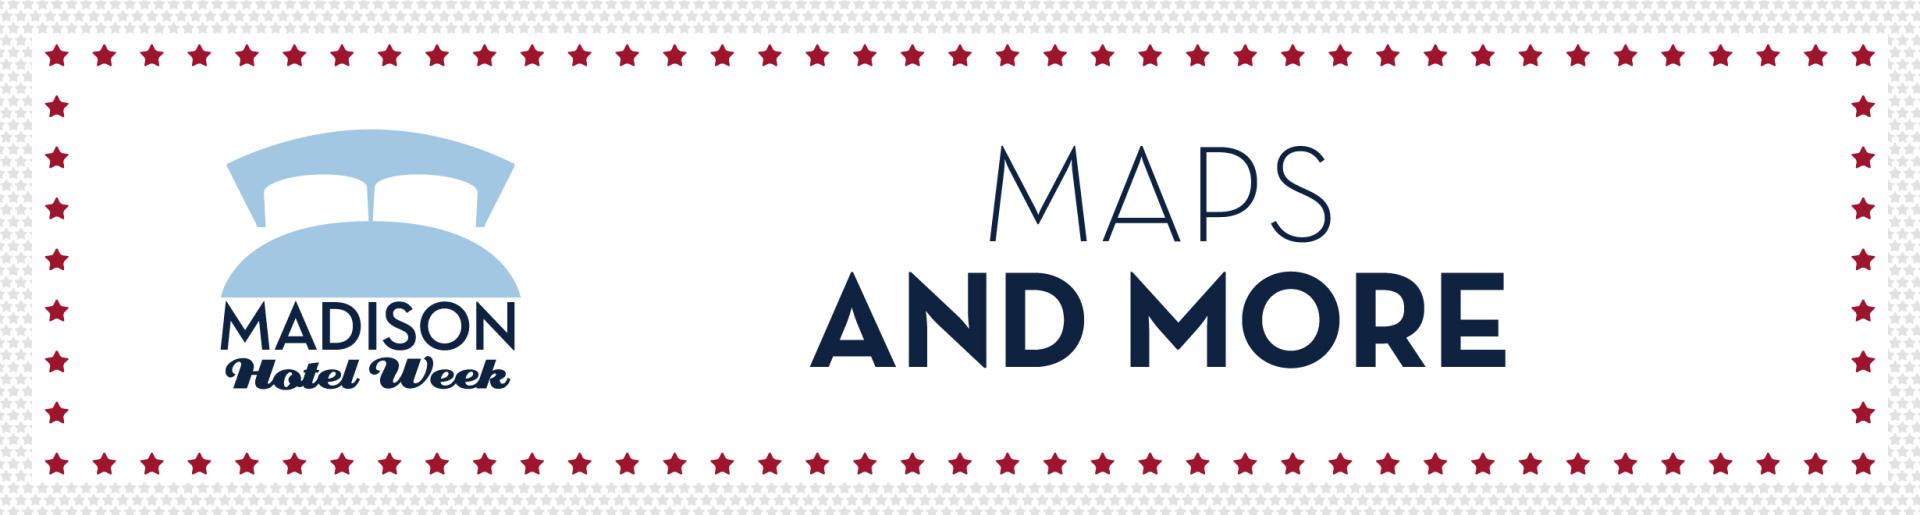 Madison Hotel Week Maps & More